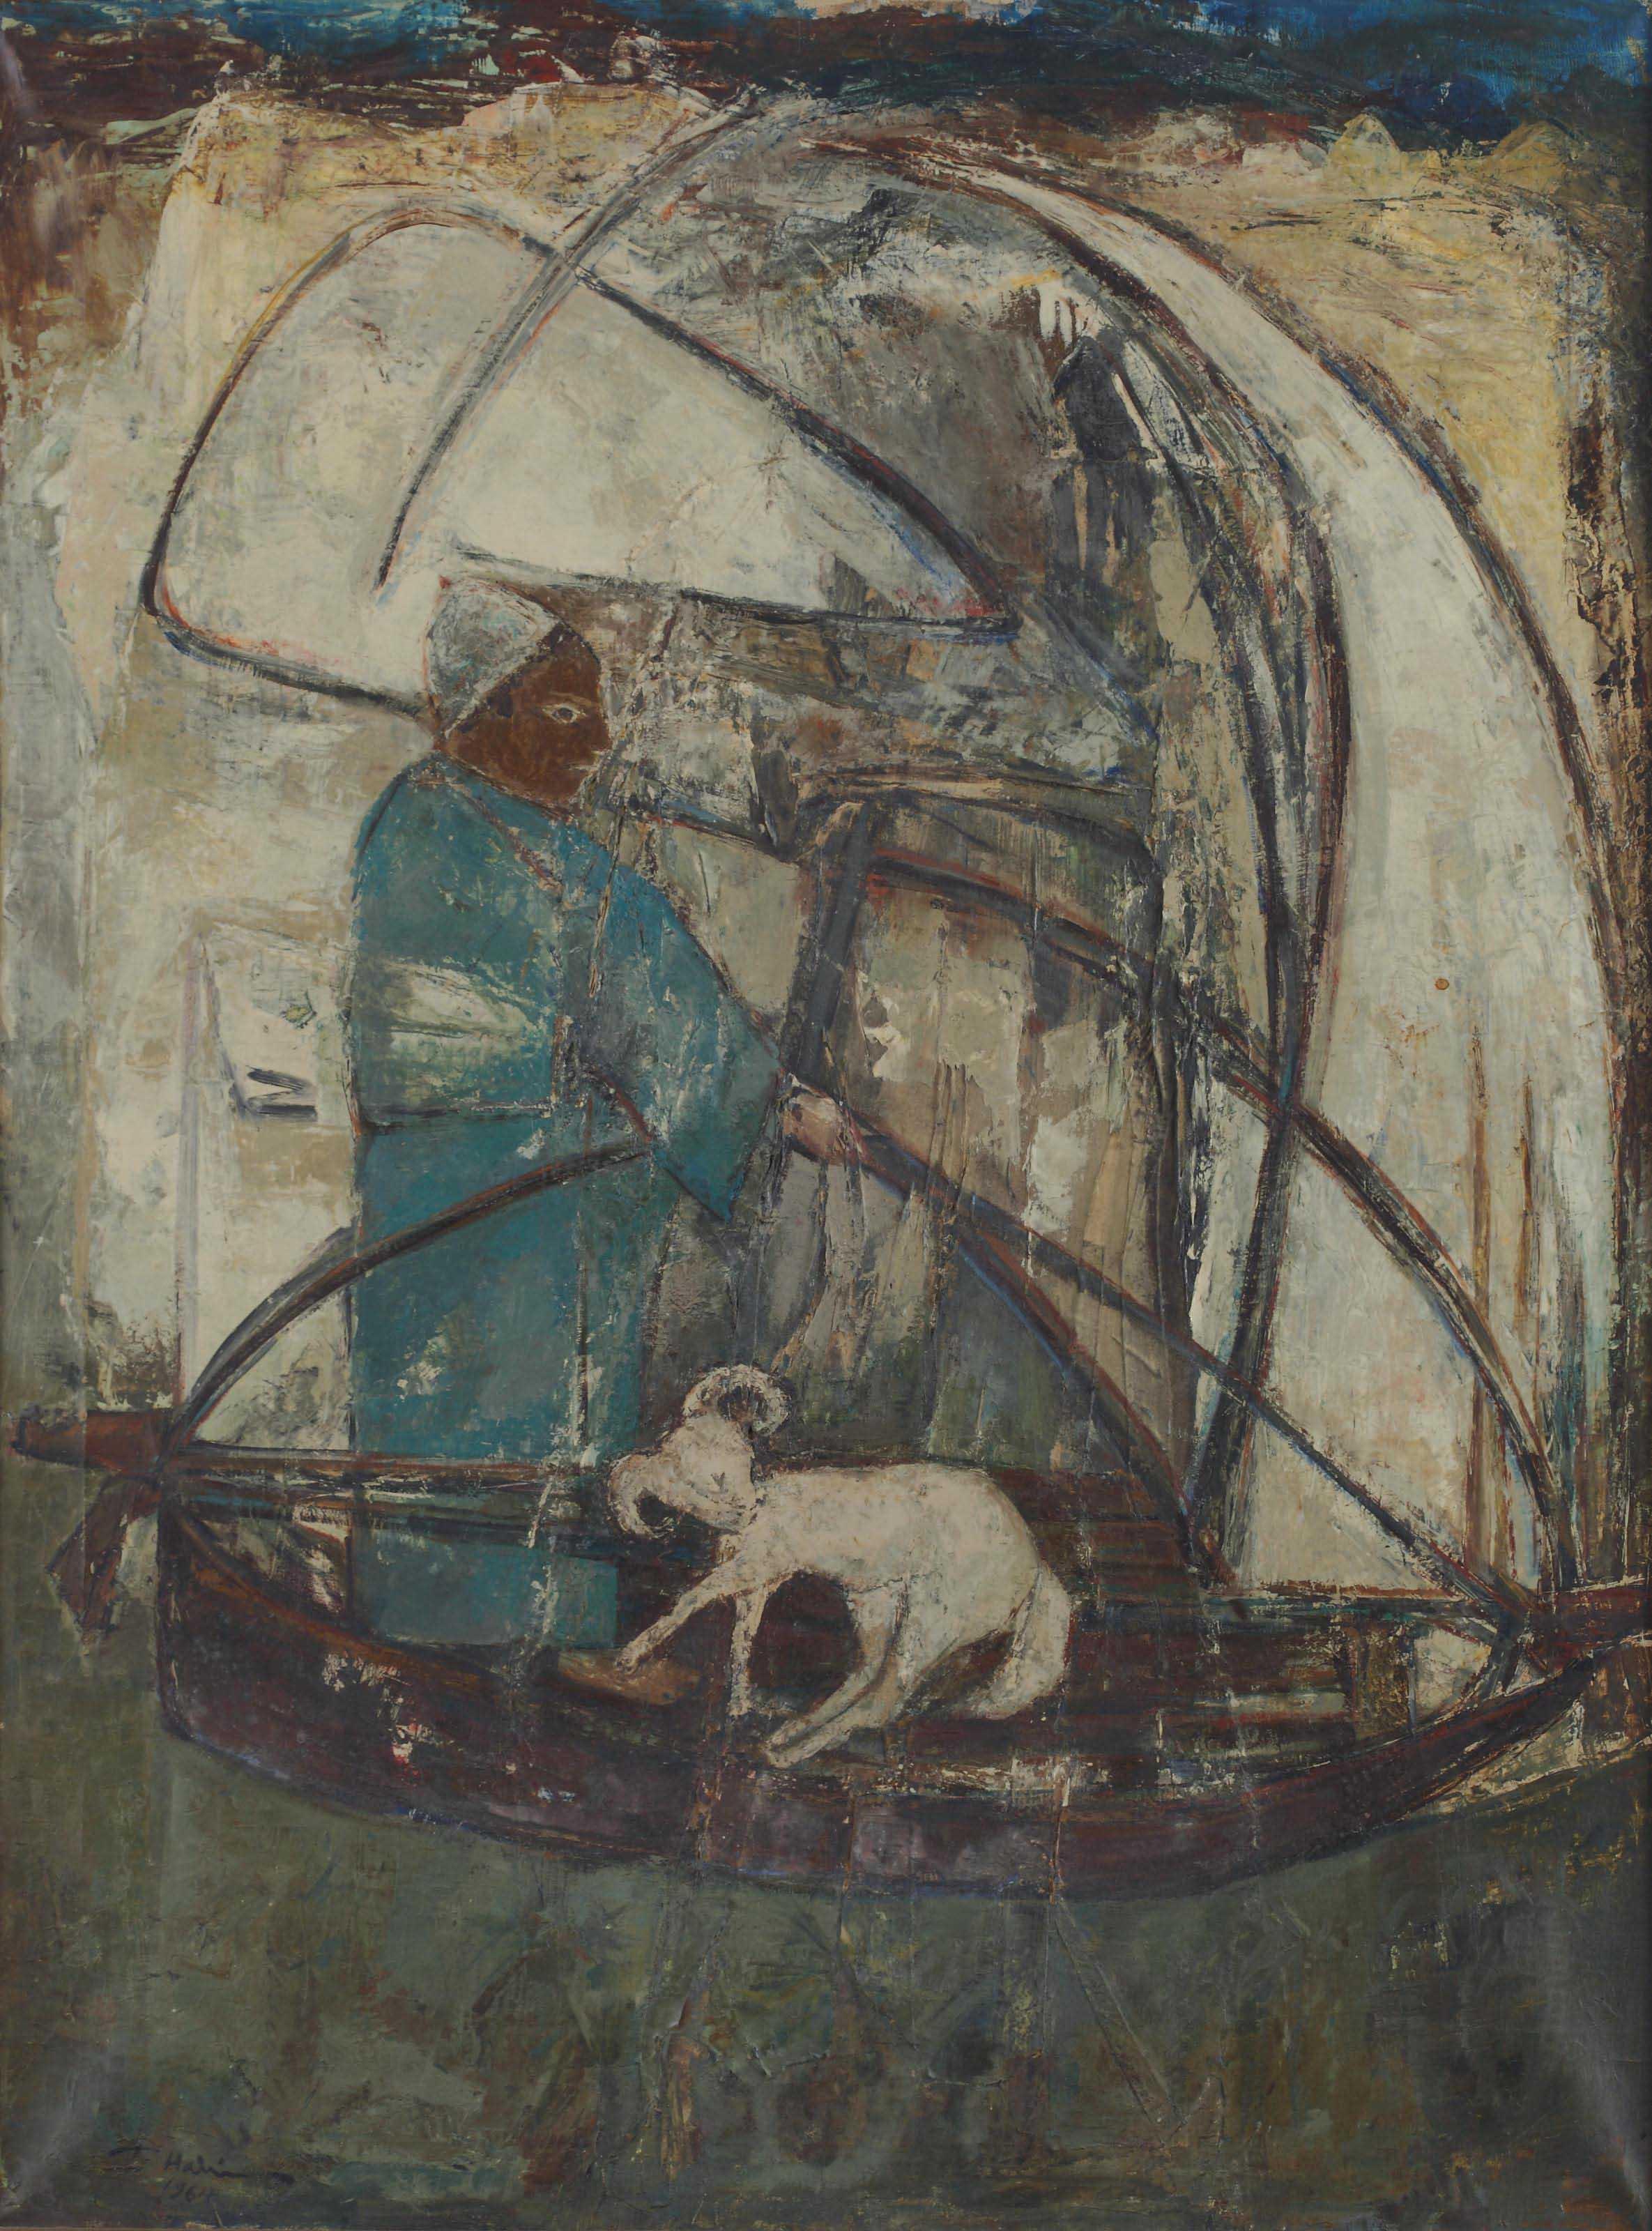 Al Murakibi (The Boatman)